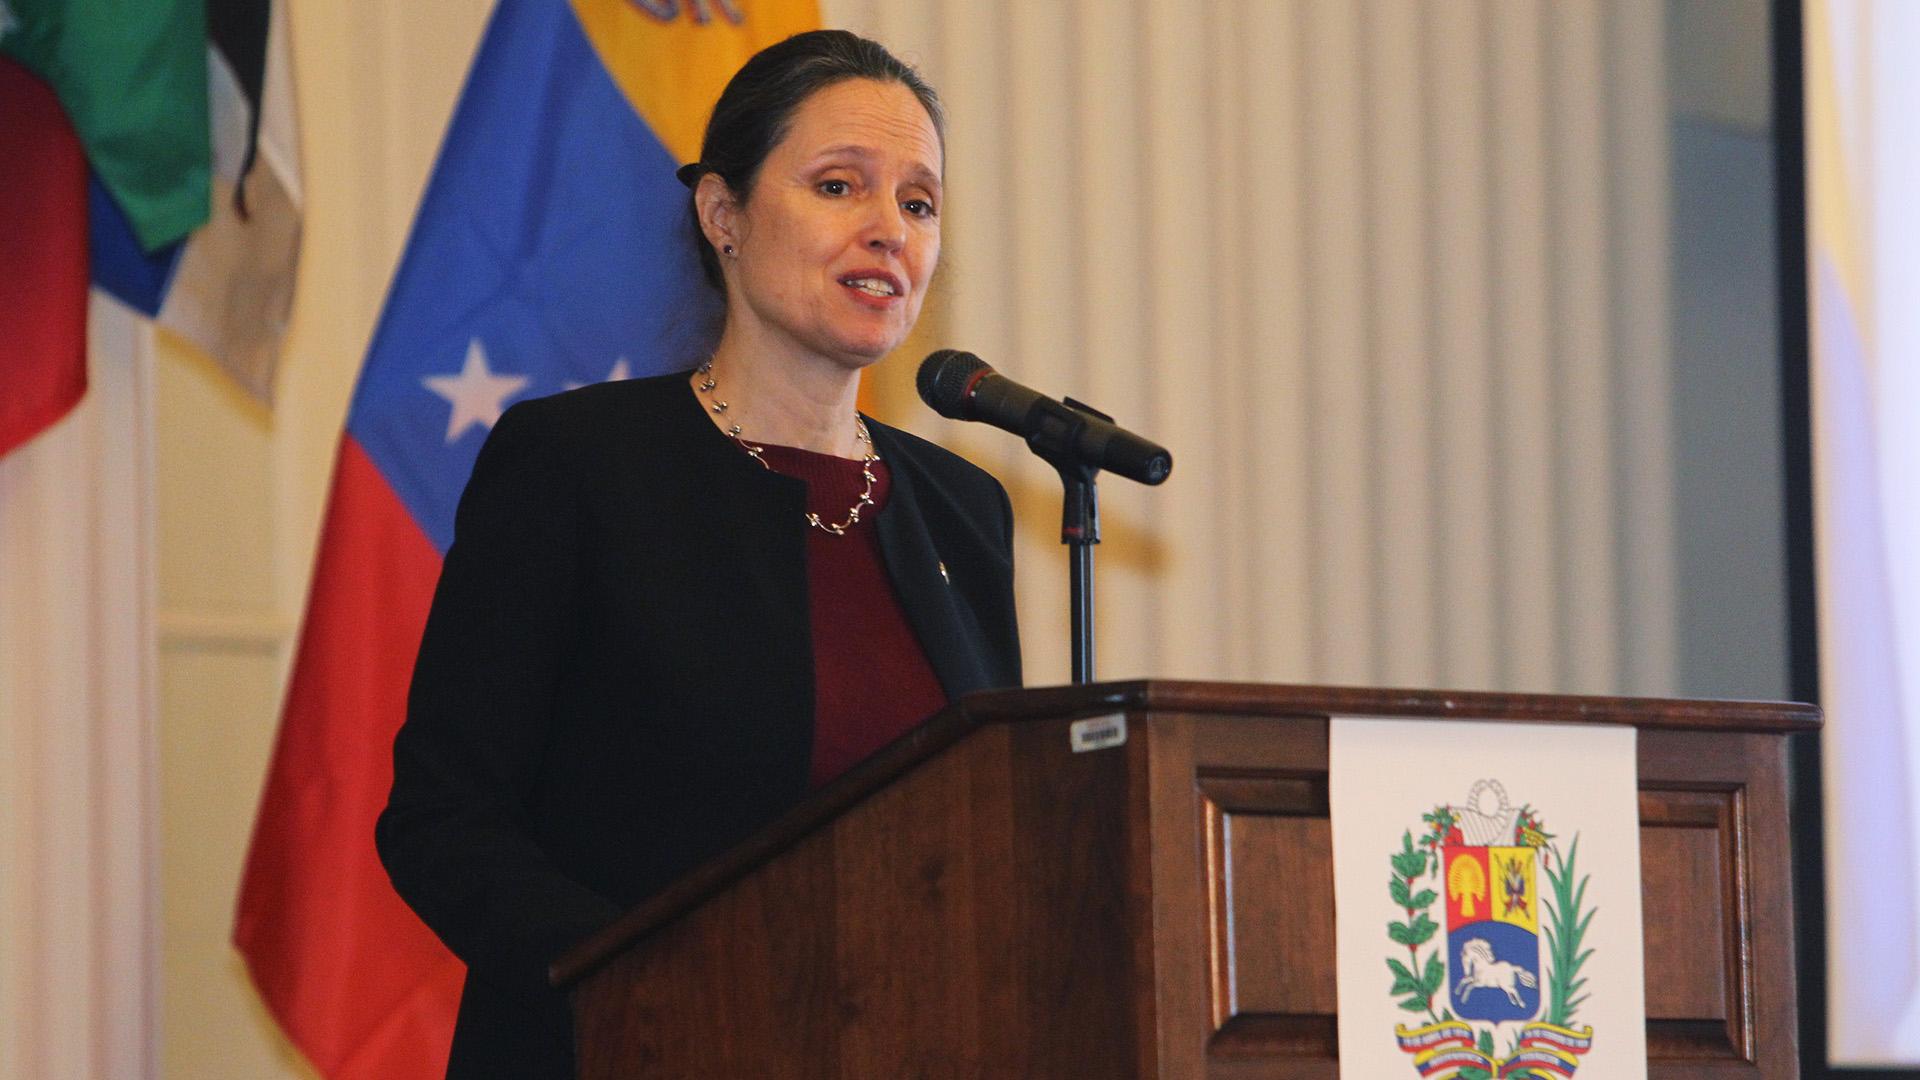 La embajadora de Canadá ante la OEA, Jennifer May Lote